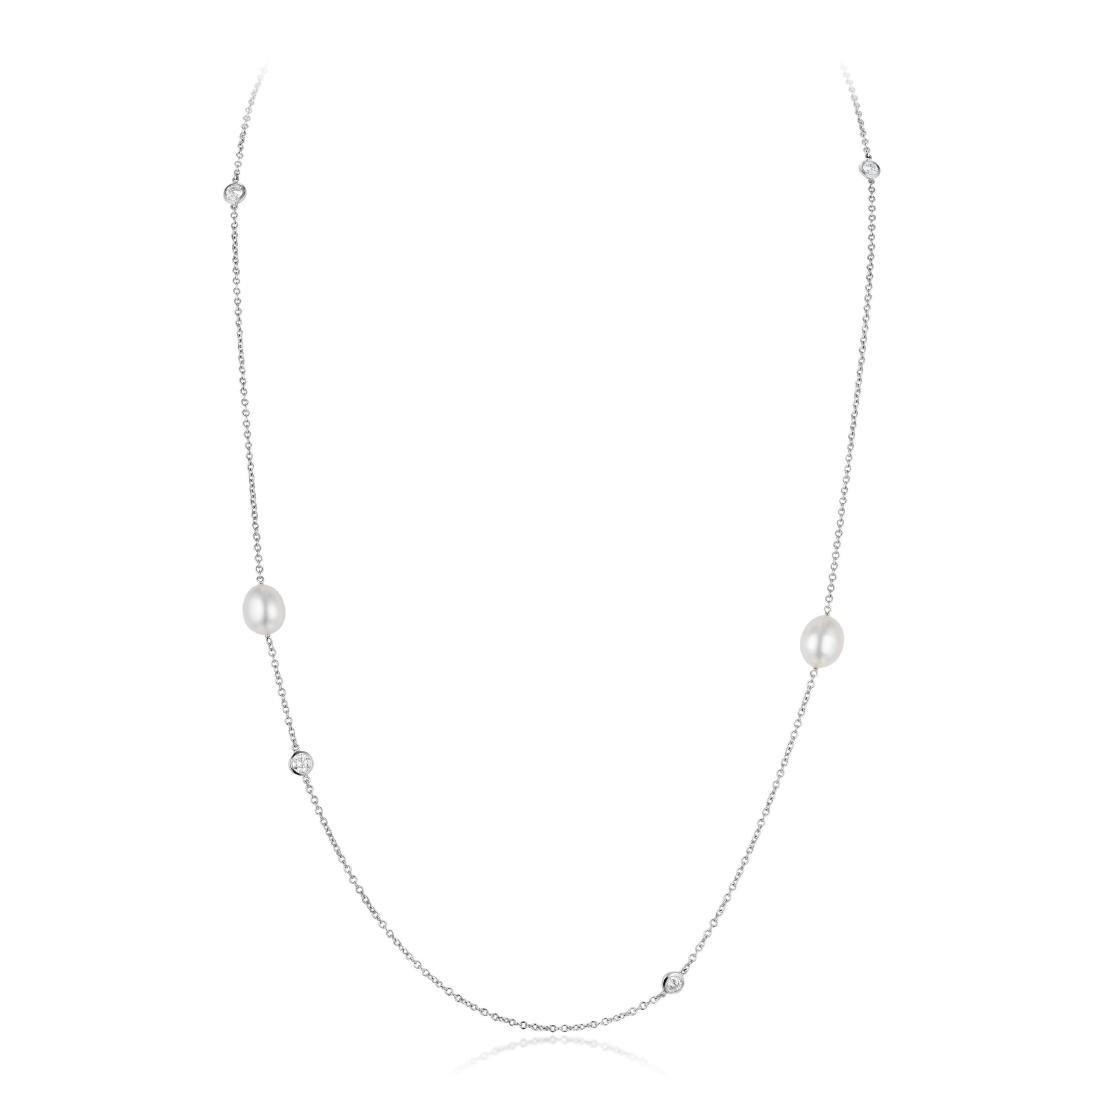 Tiffany & Co. Elsa Peretti Diamond and Keshi Pearl